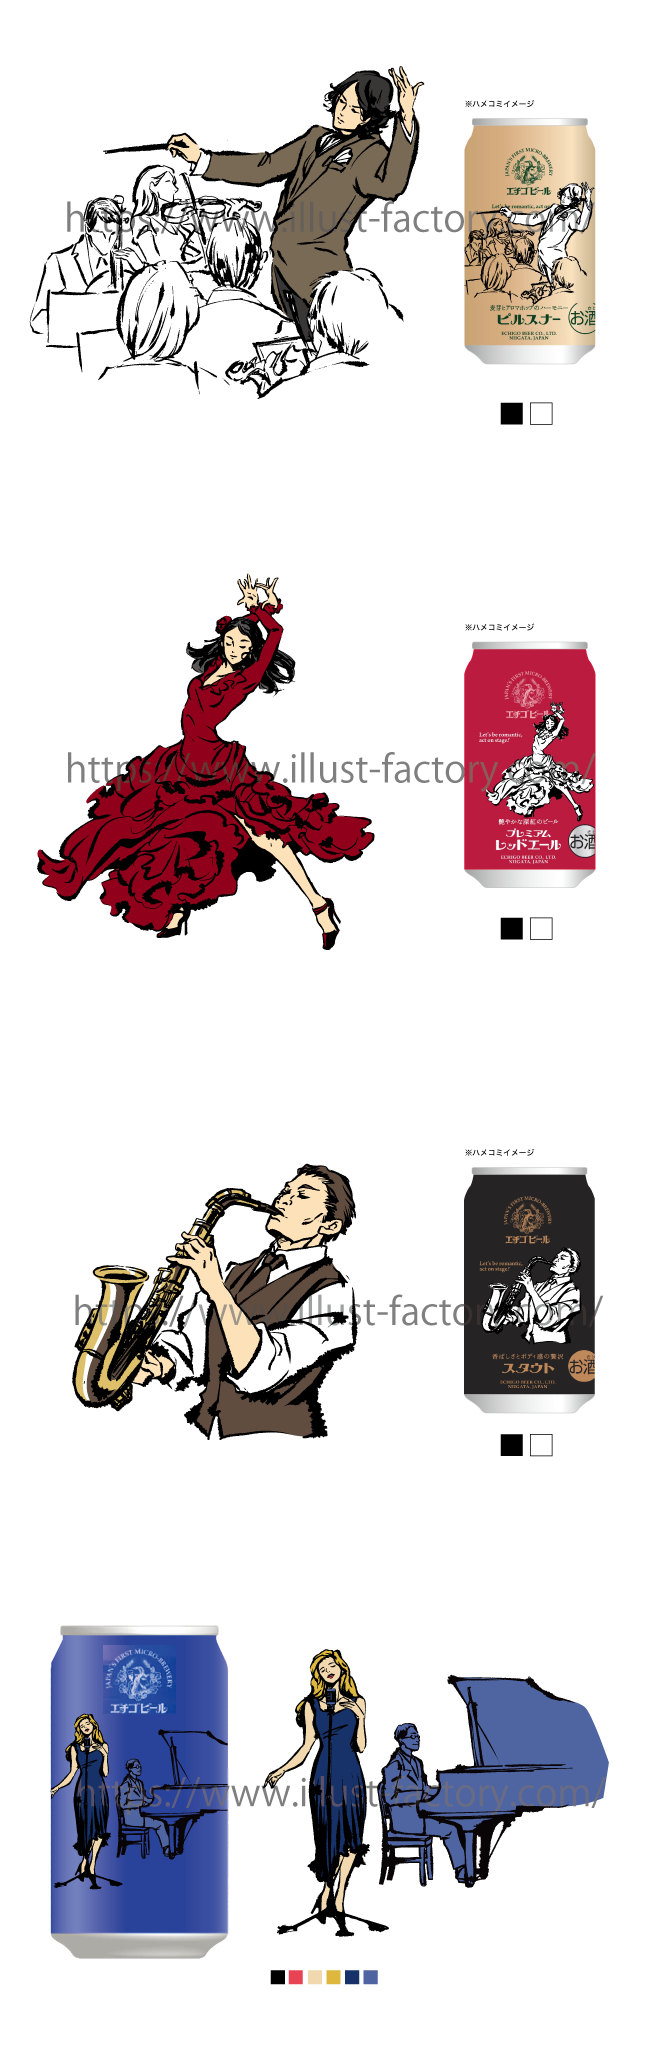 B87 手描き風タッチ躍動感ある人物イラスト制作例(オーケストラ・フラメンコ・サックス・歌手)